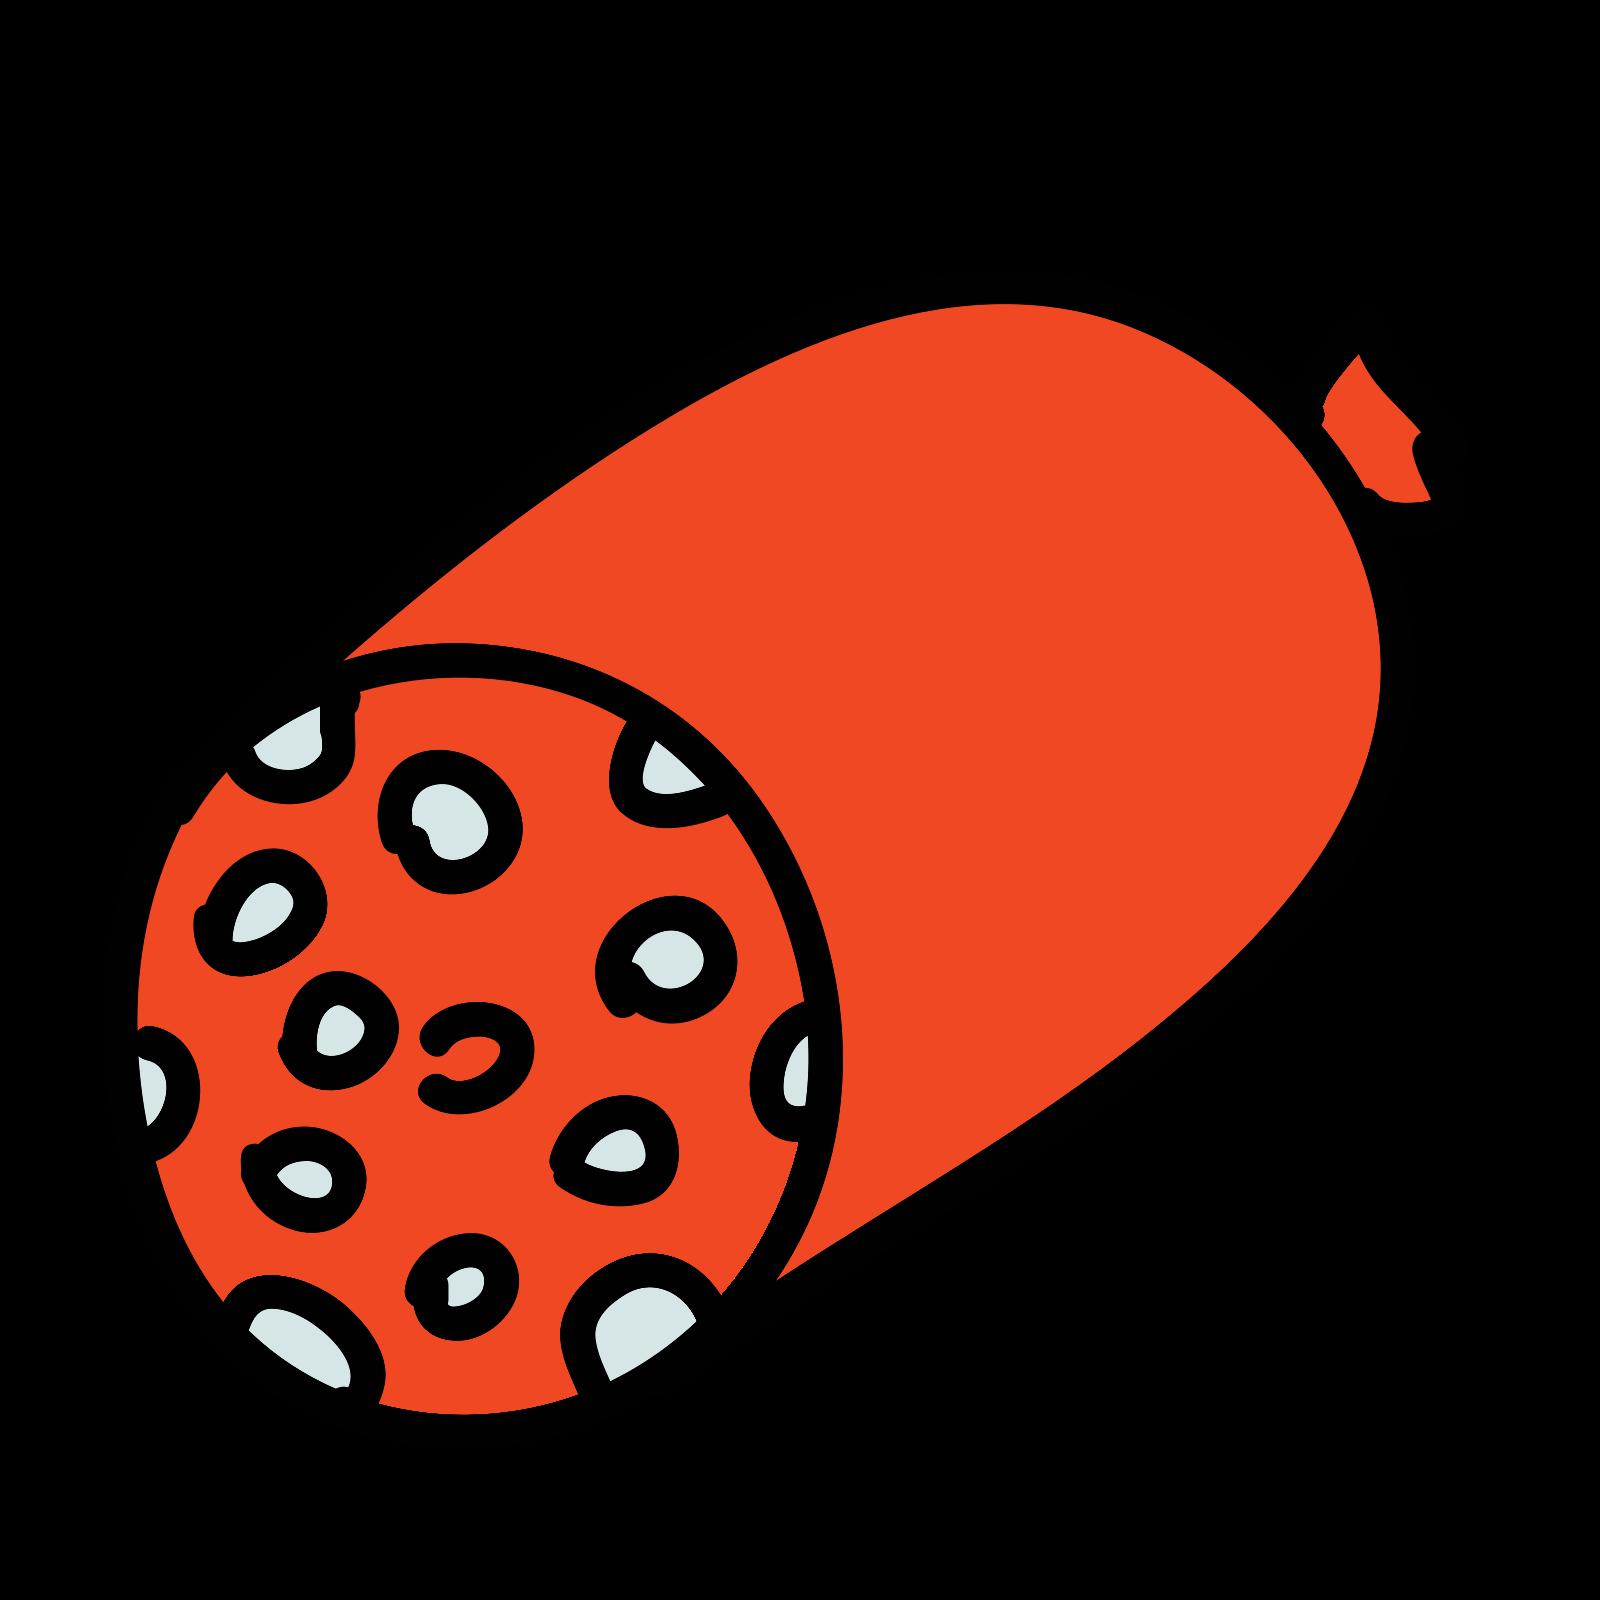 Kiełbasa icon